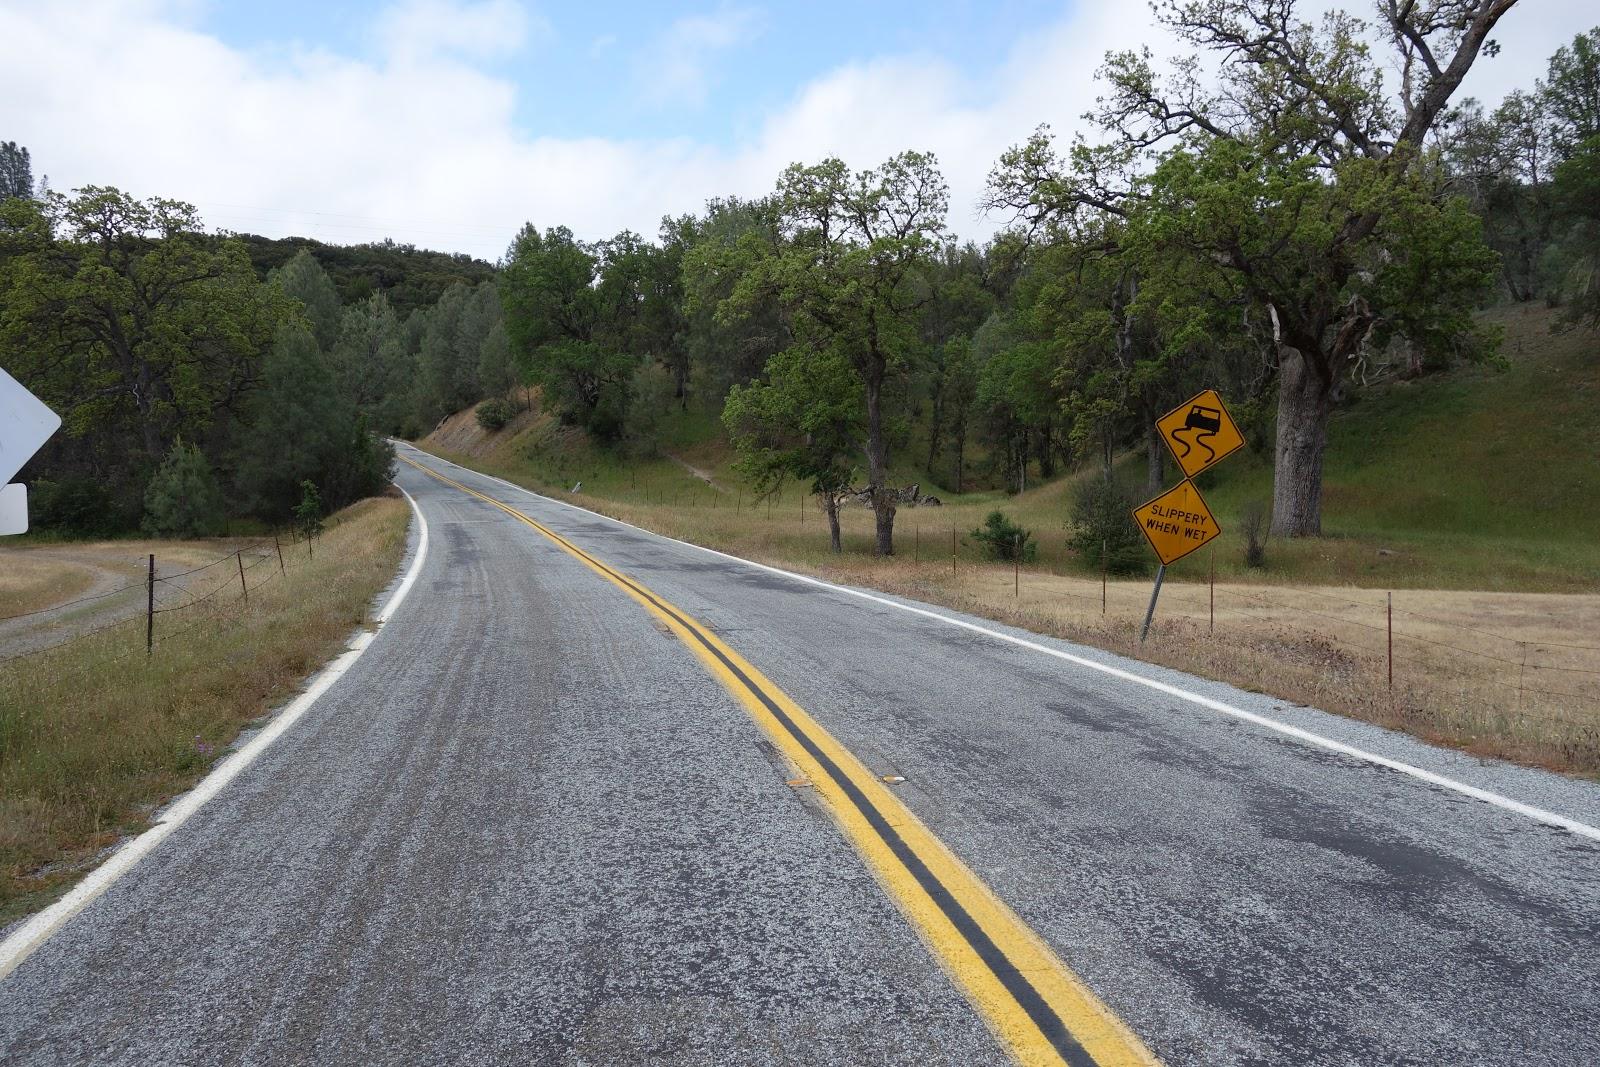 Beginning of Mt. Hamilton East road bike climb - road sign and road.